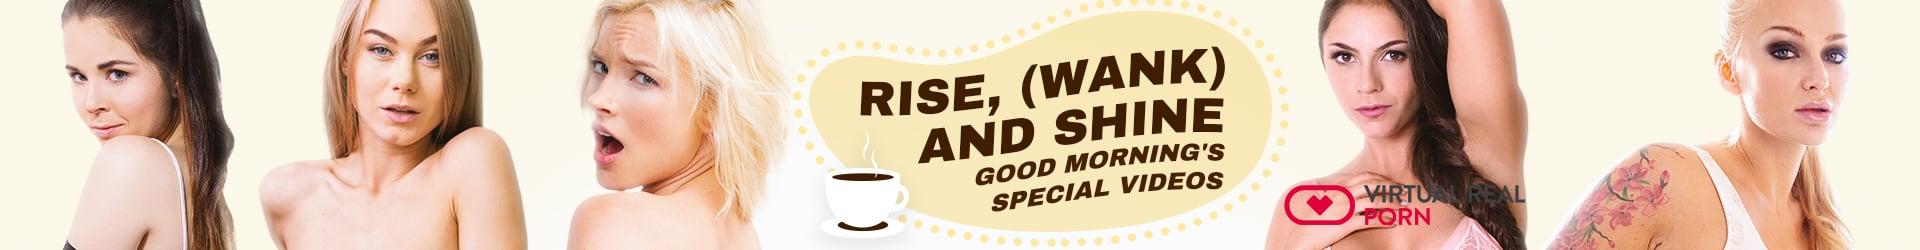 Good morning special